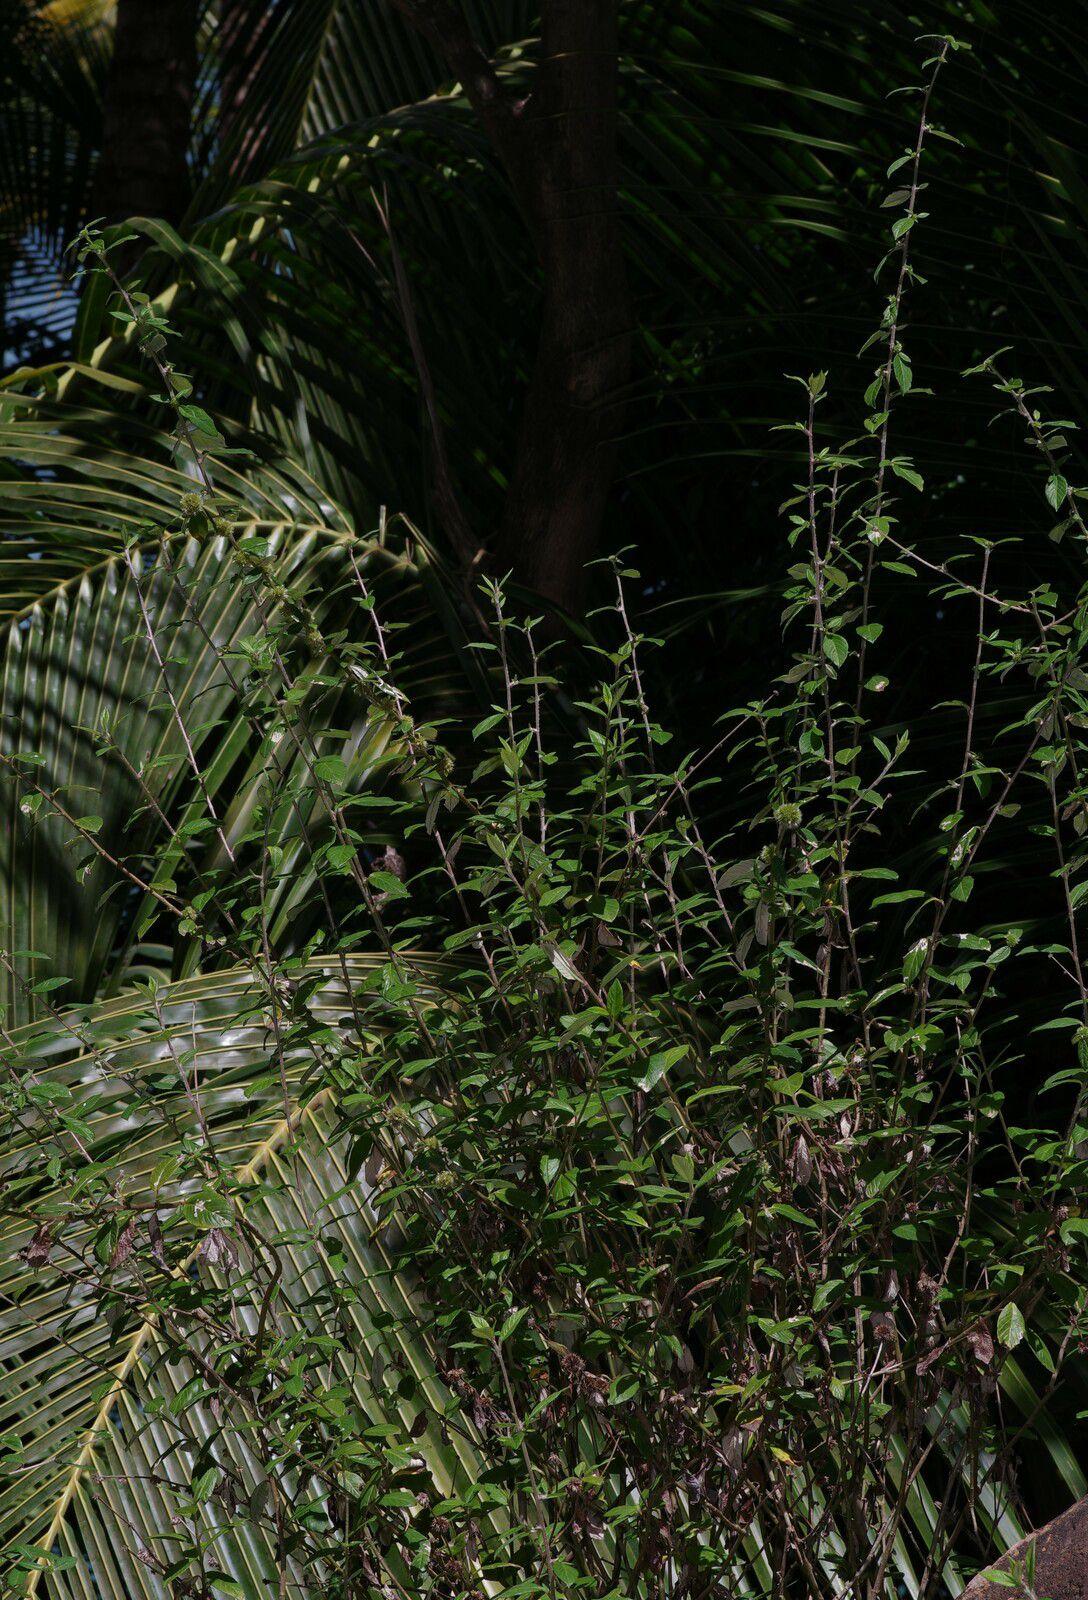 Rolandra fruticosa (radié commandeur, tête de nègre)